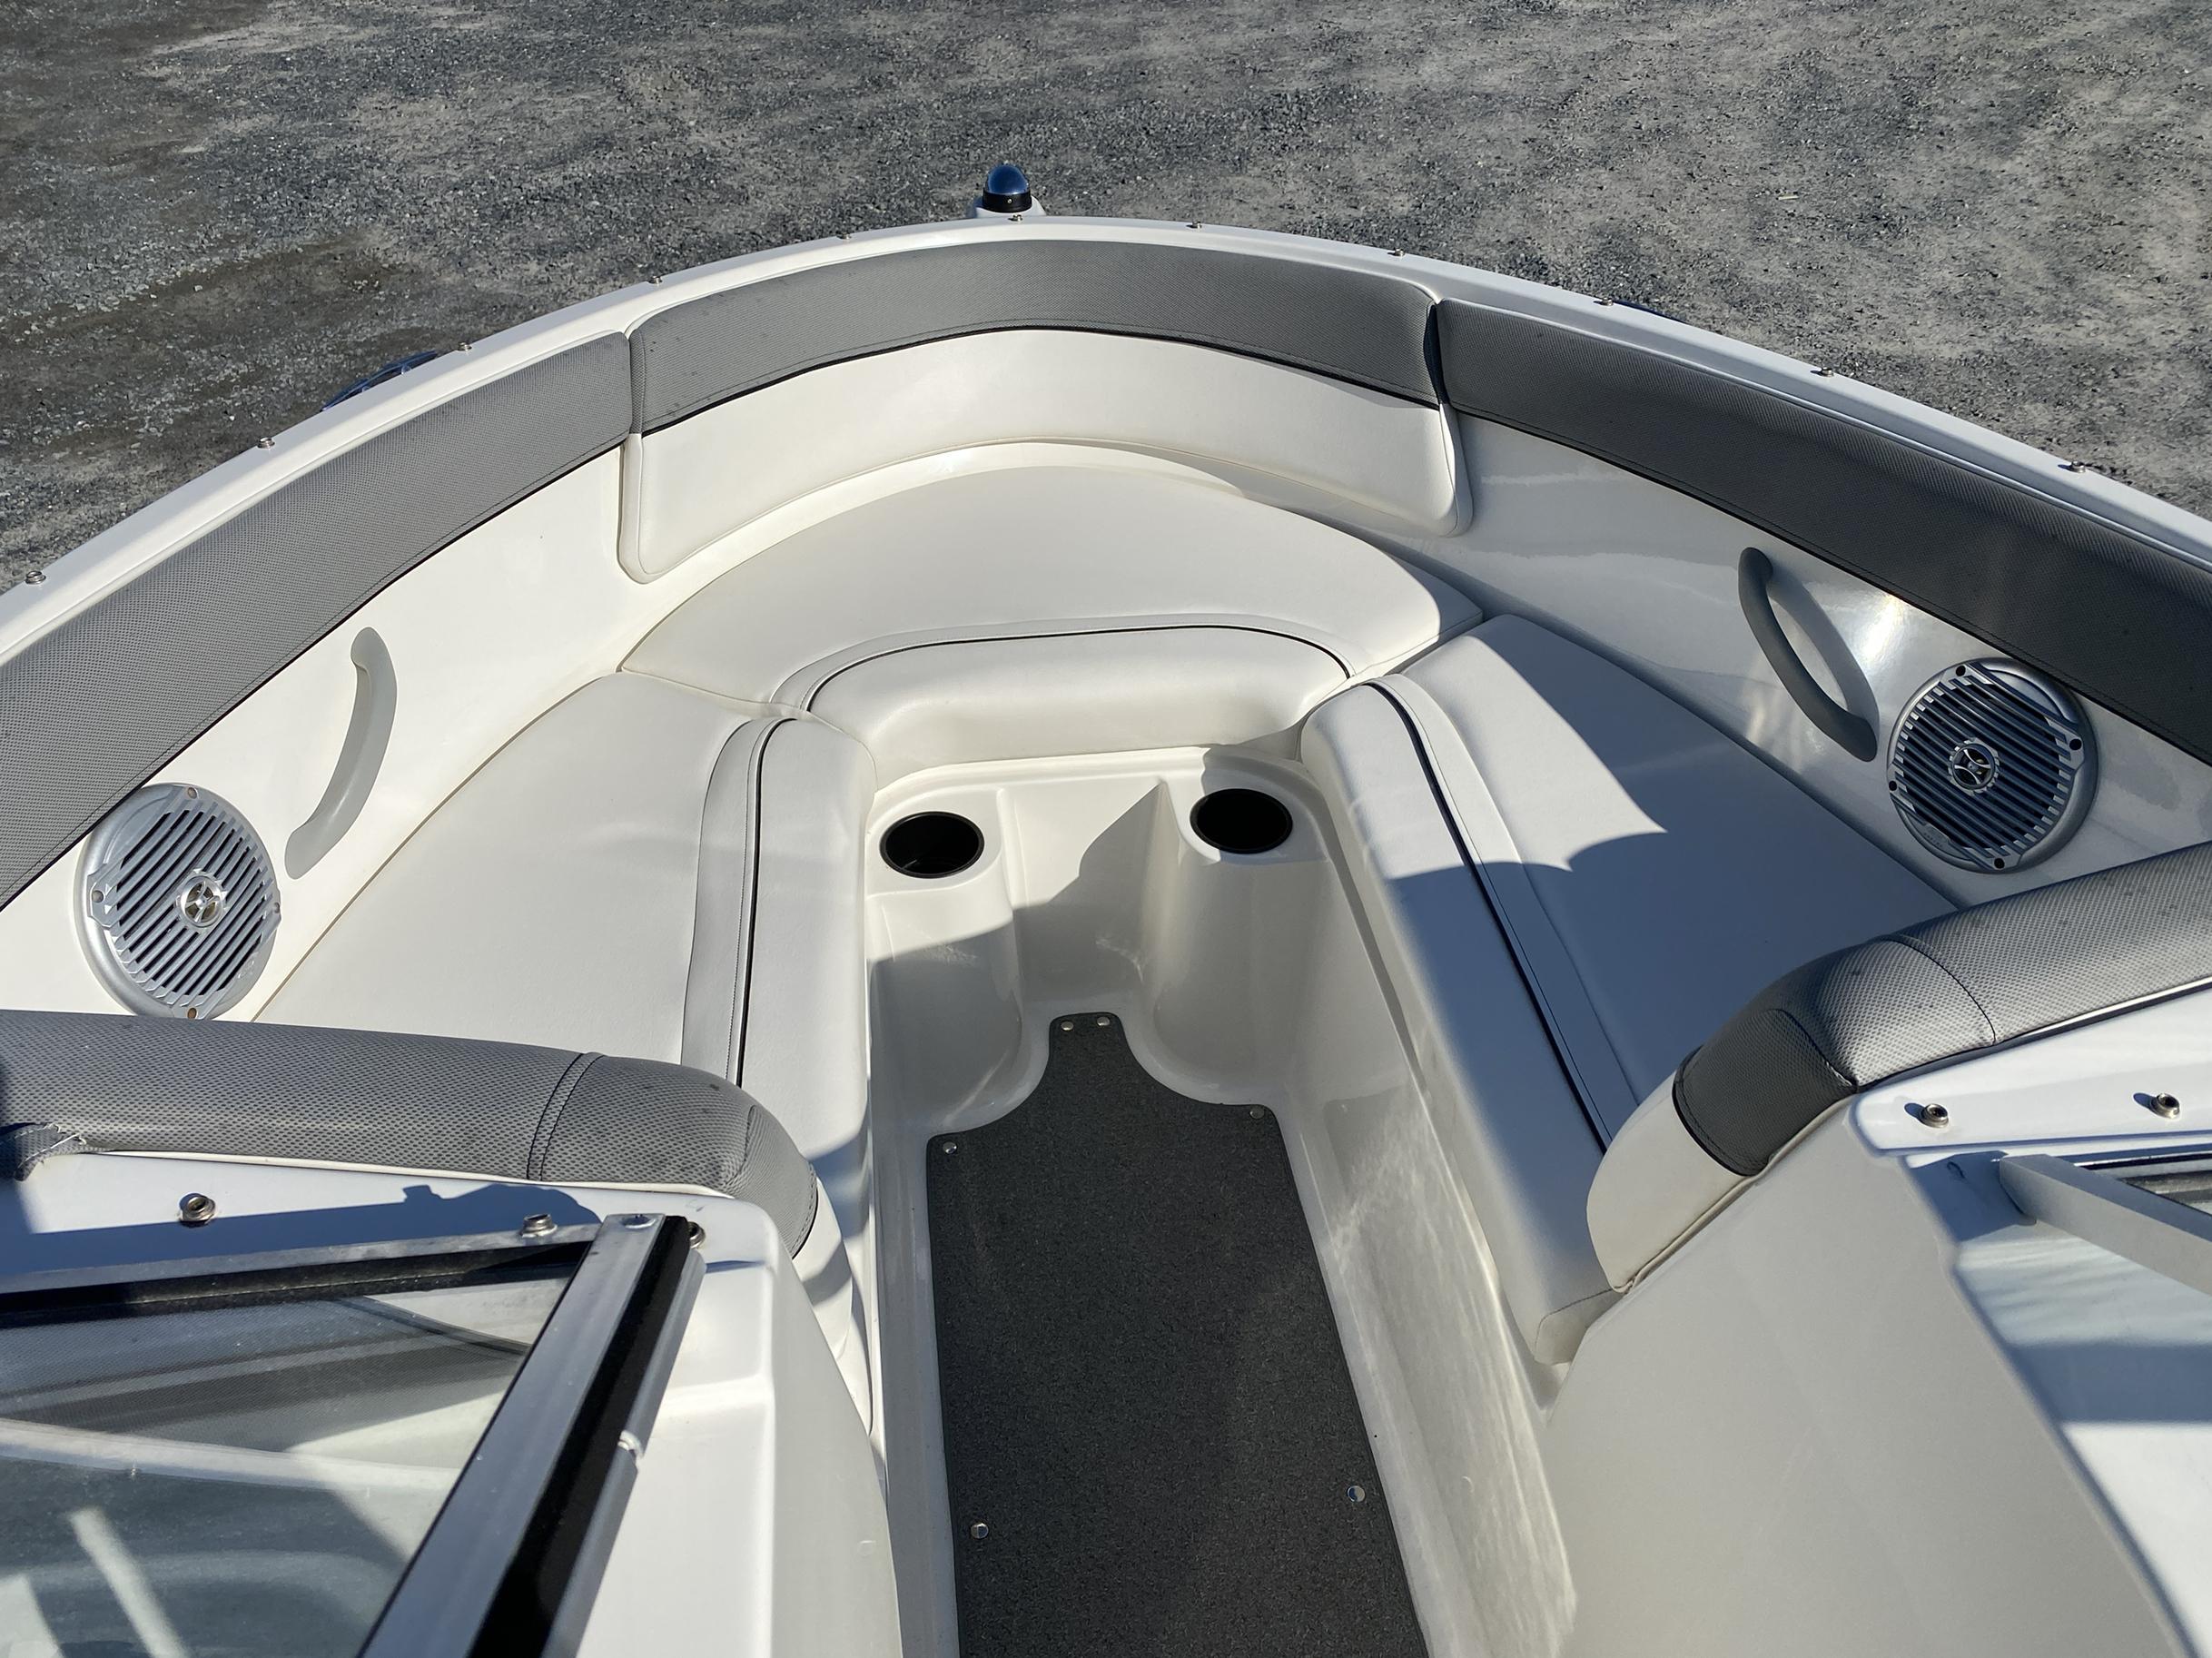 2014 Bayliner boat for sale, model of the boat is 190 Bowrider & Image # 8 of 10